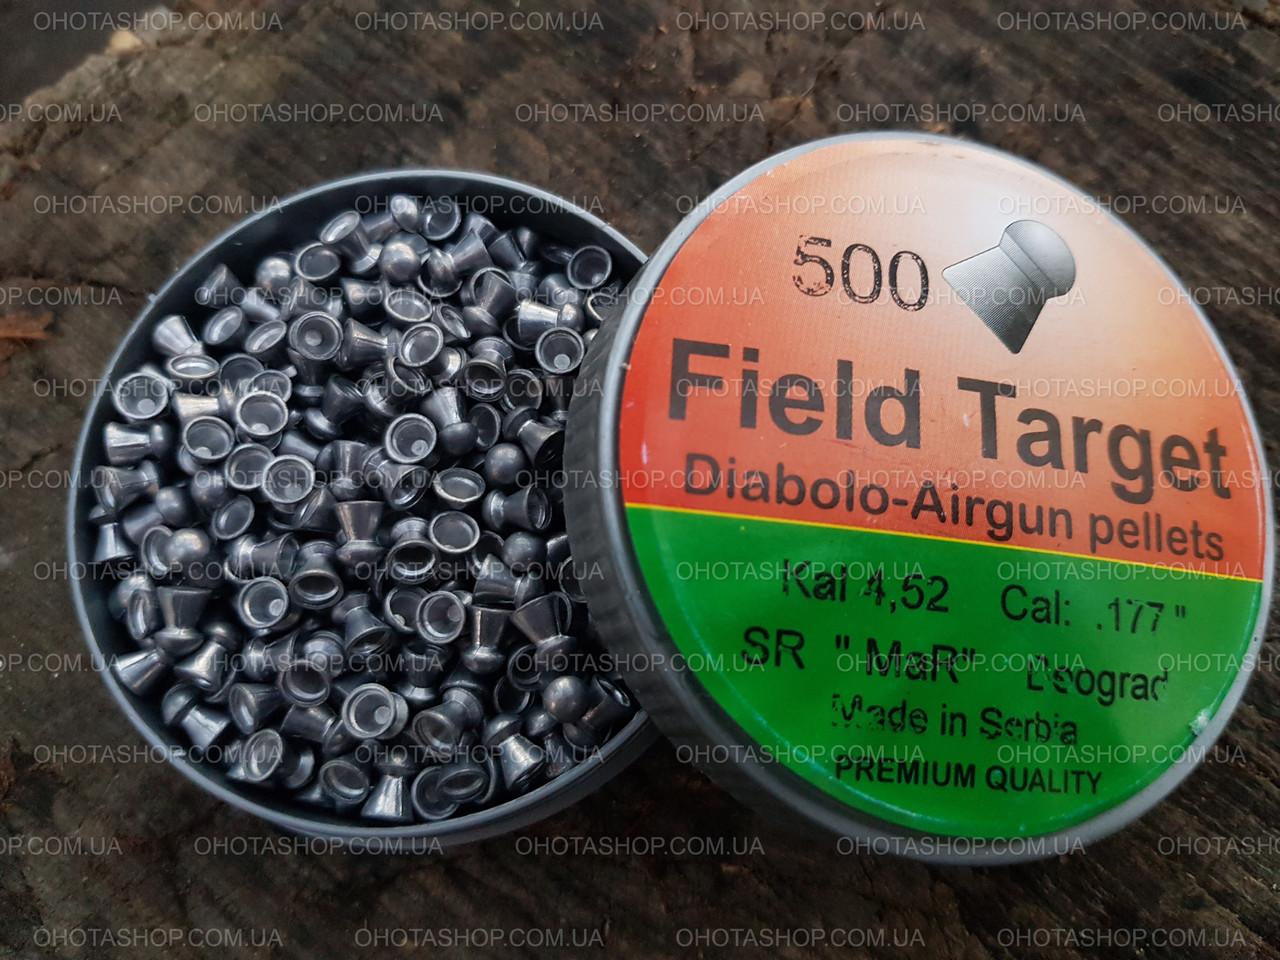 Пули Field Target 0.51 (4.52 мм)